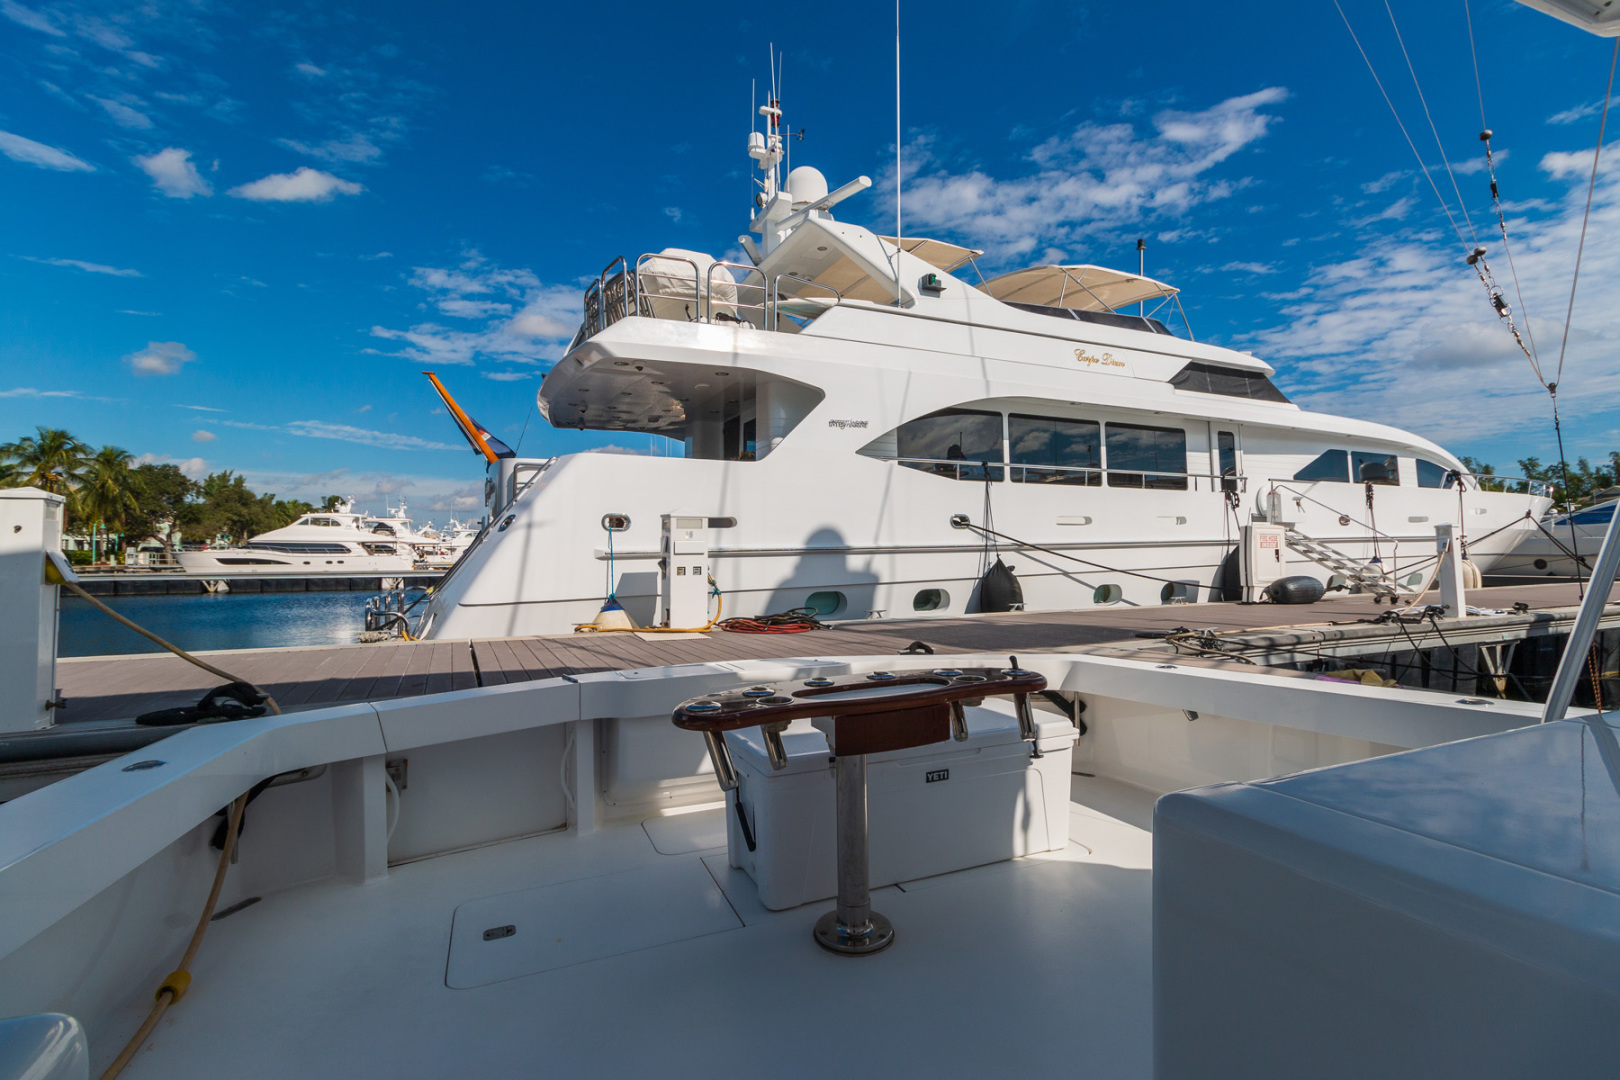 Viking-Convertible 2000-Knotty Girl Fort Lauderdale-Florida-United States-1564768   Thumbnail